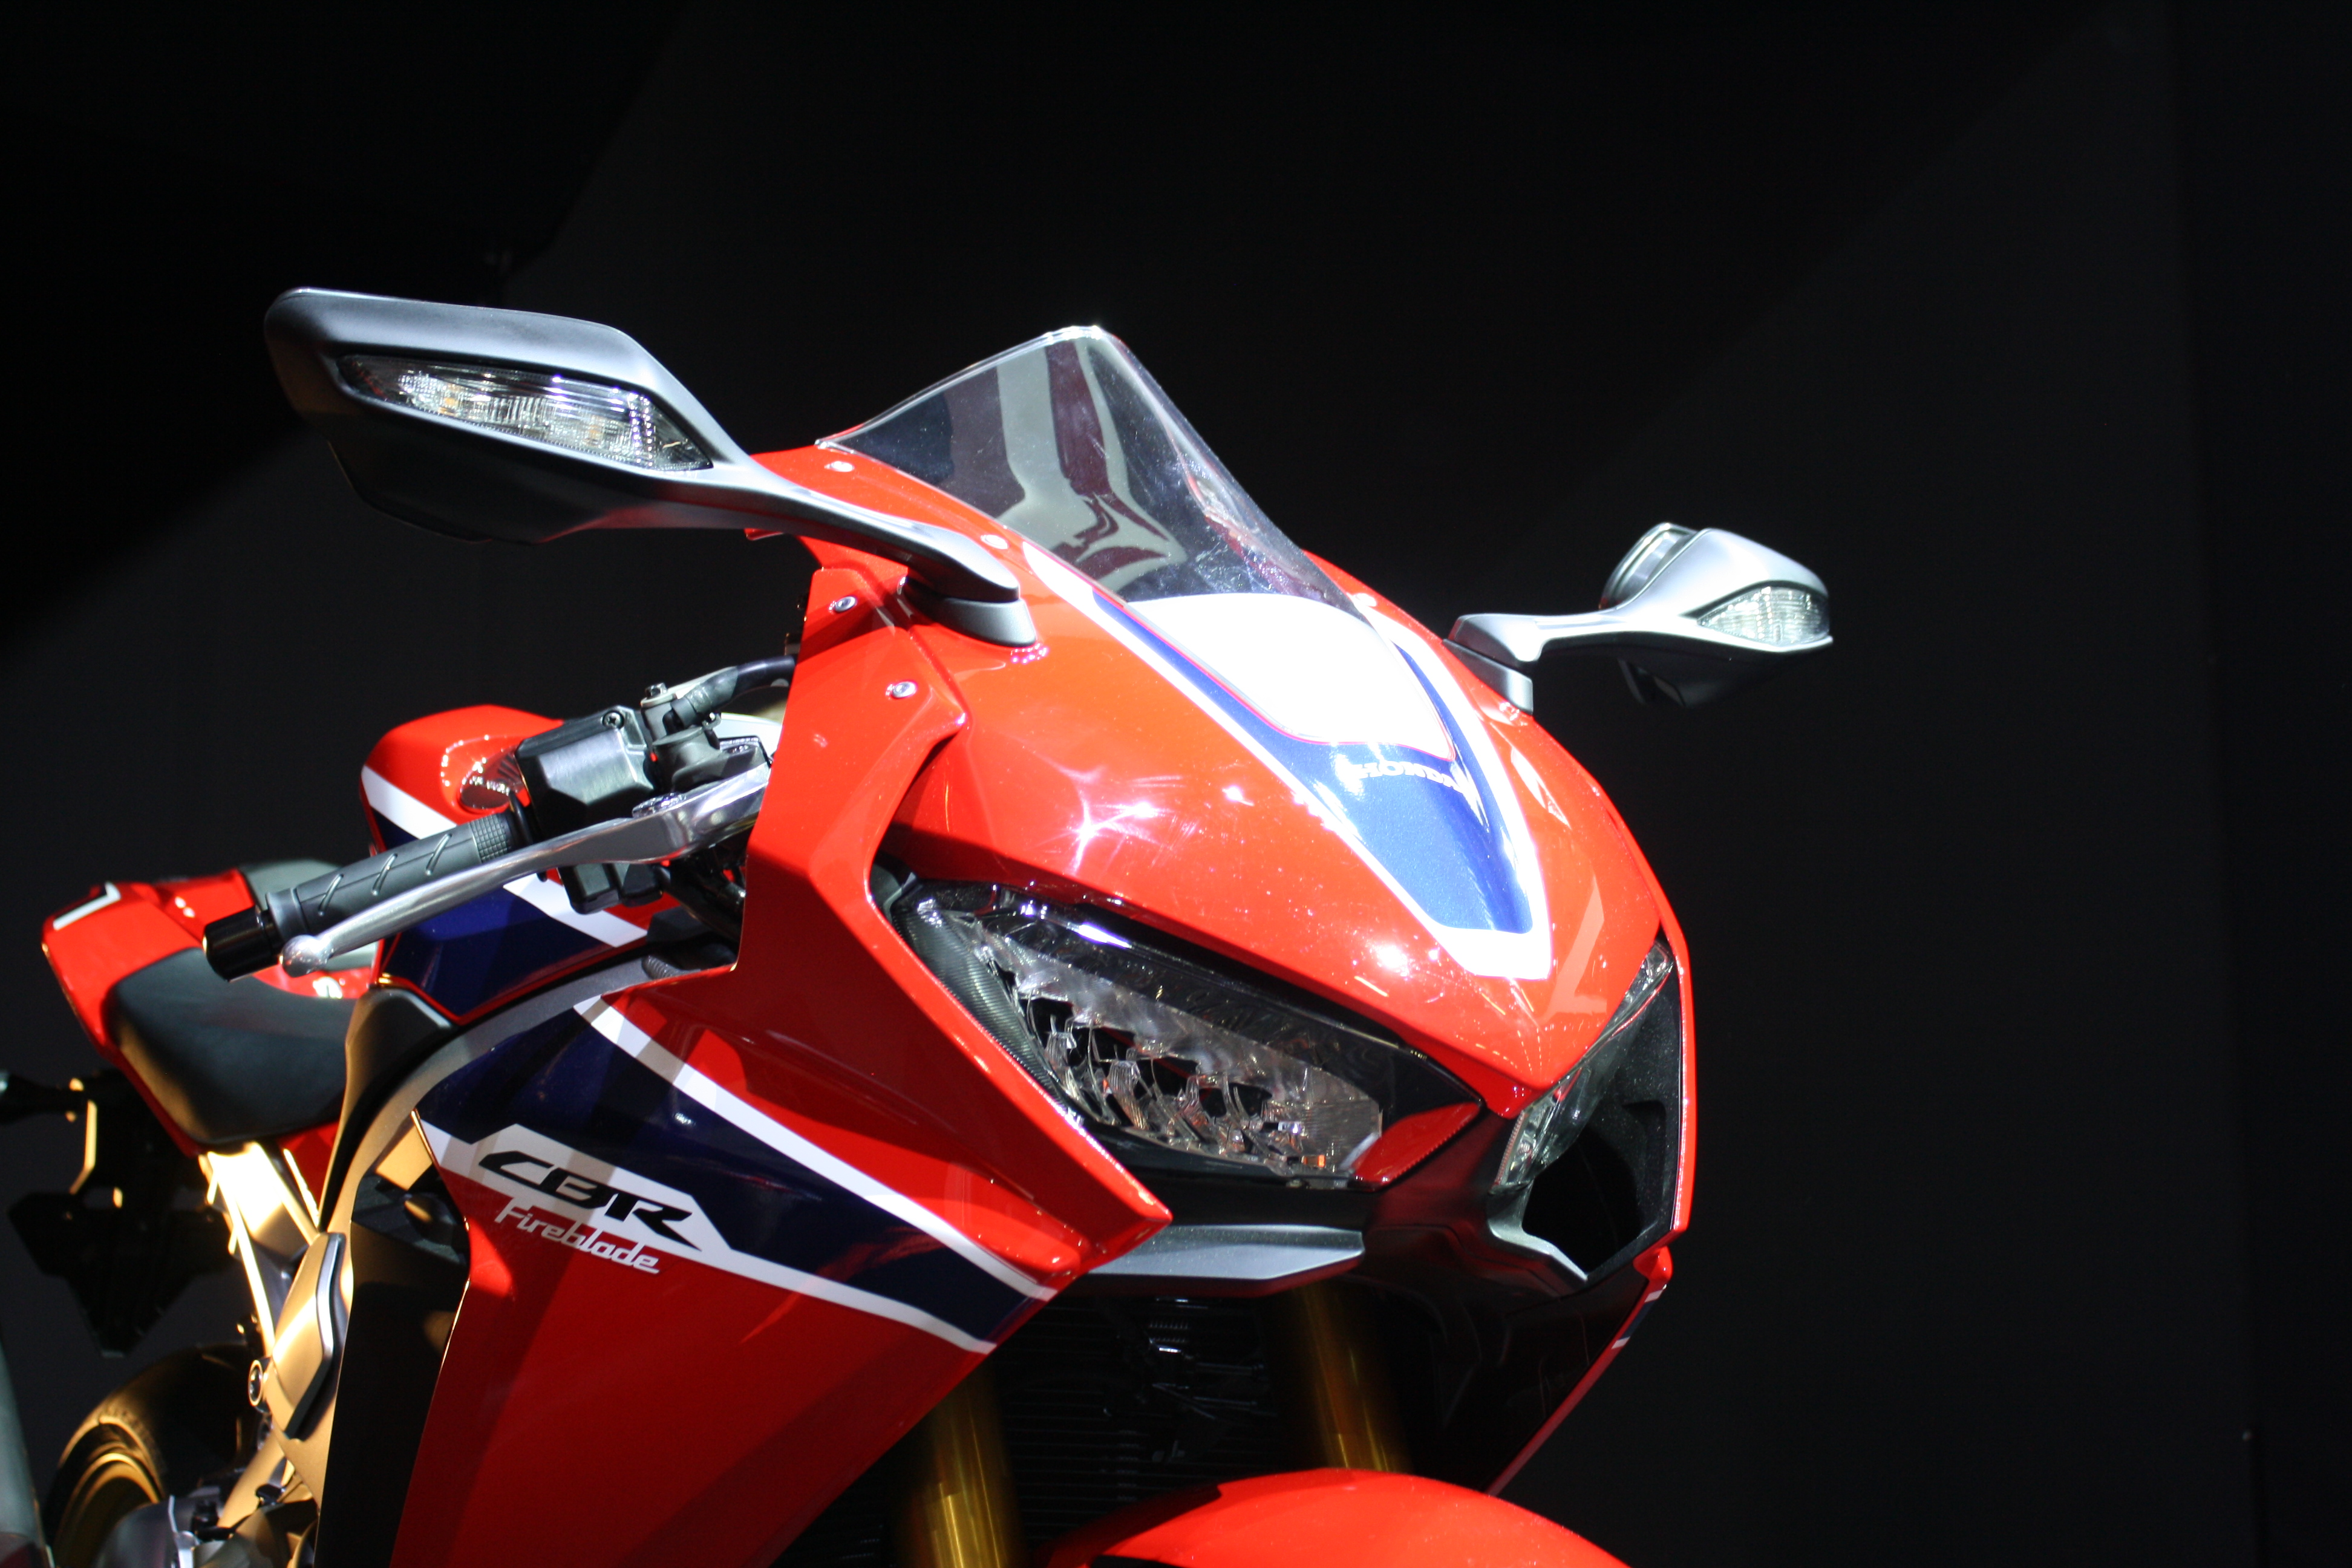 All New 2017 Honda Cbr1000rr Fireblade additionally 2017 Honda Cbr1000rr Fireblade Sp as well 2012 2015 Honda Cbr 1000rr Slip On Exhaust Kit likewise 2017 Honda Cbr1000rr Fireblade Detailed At Eicma 112875 likewise Andrew Butler Motorcycle Photographer Yamaha R1 2016 Nik4628a. on 2016 honda cbr1000rr fireblade